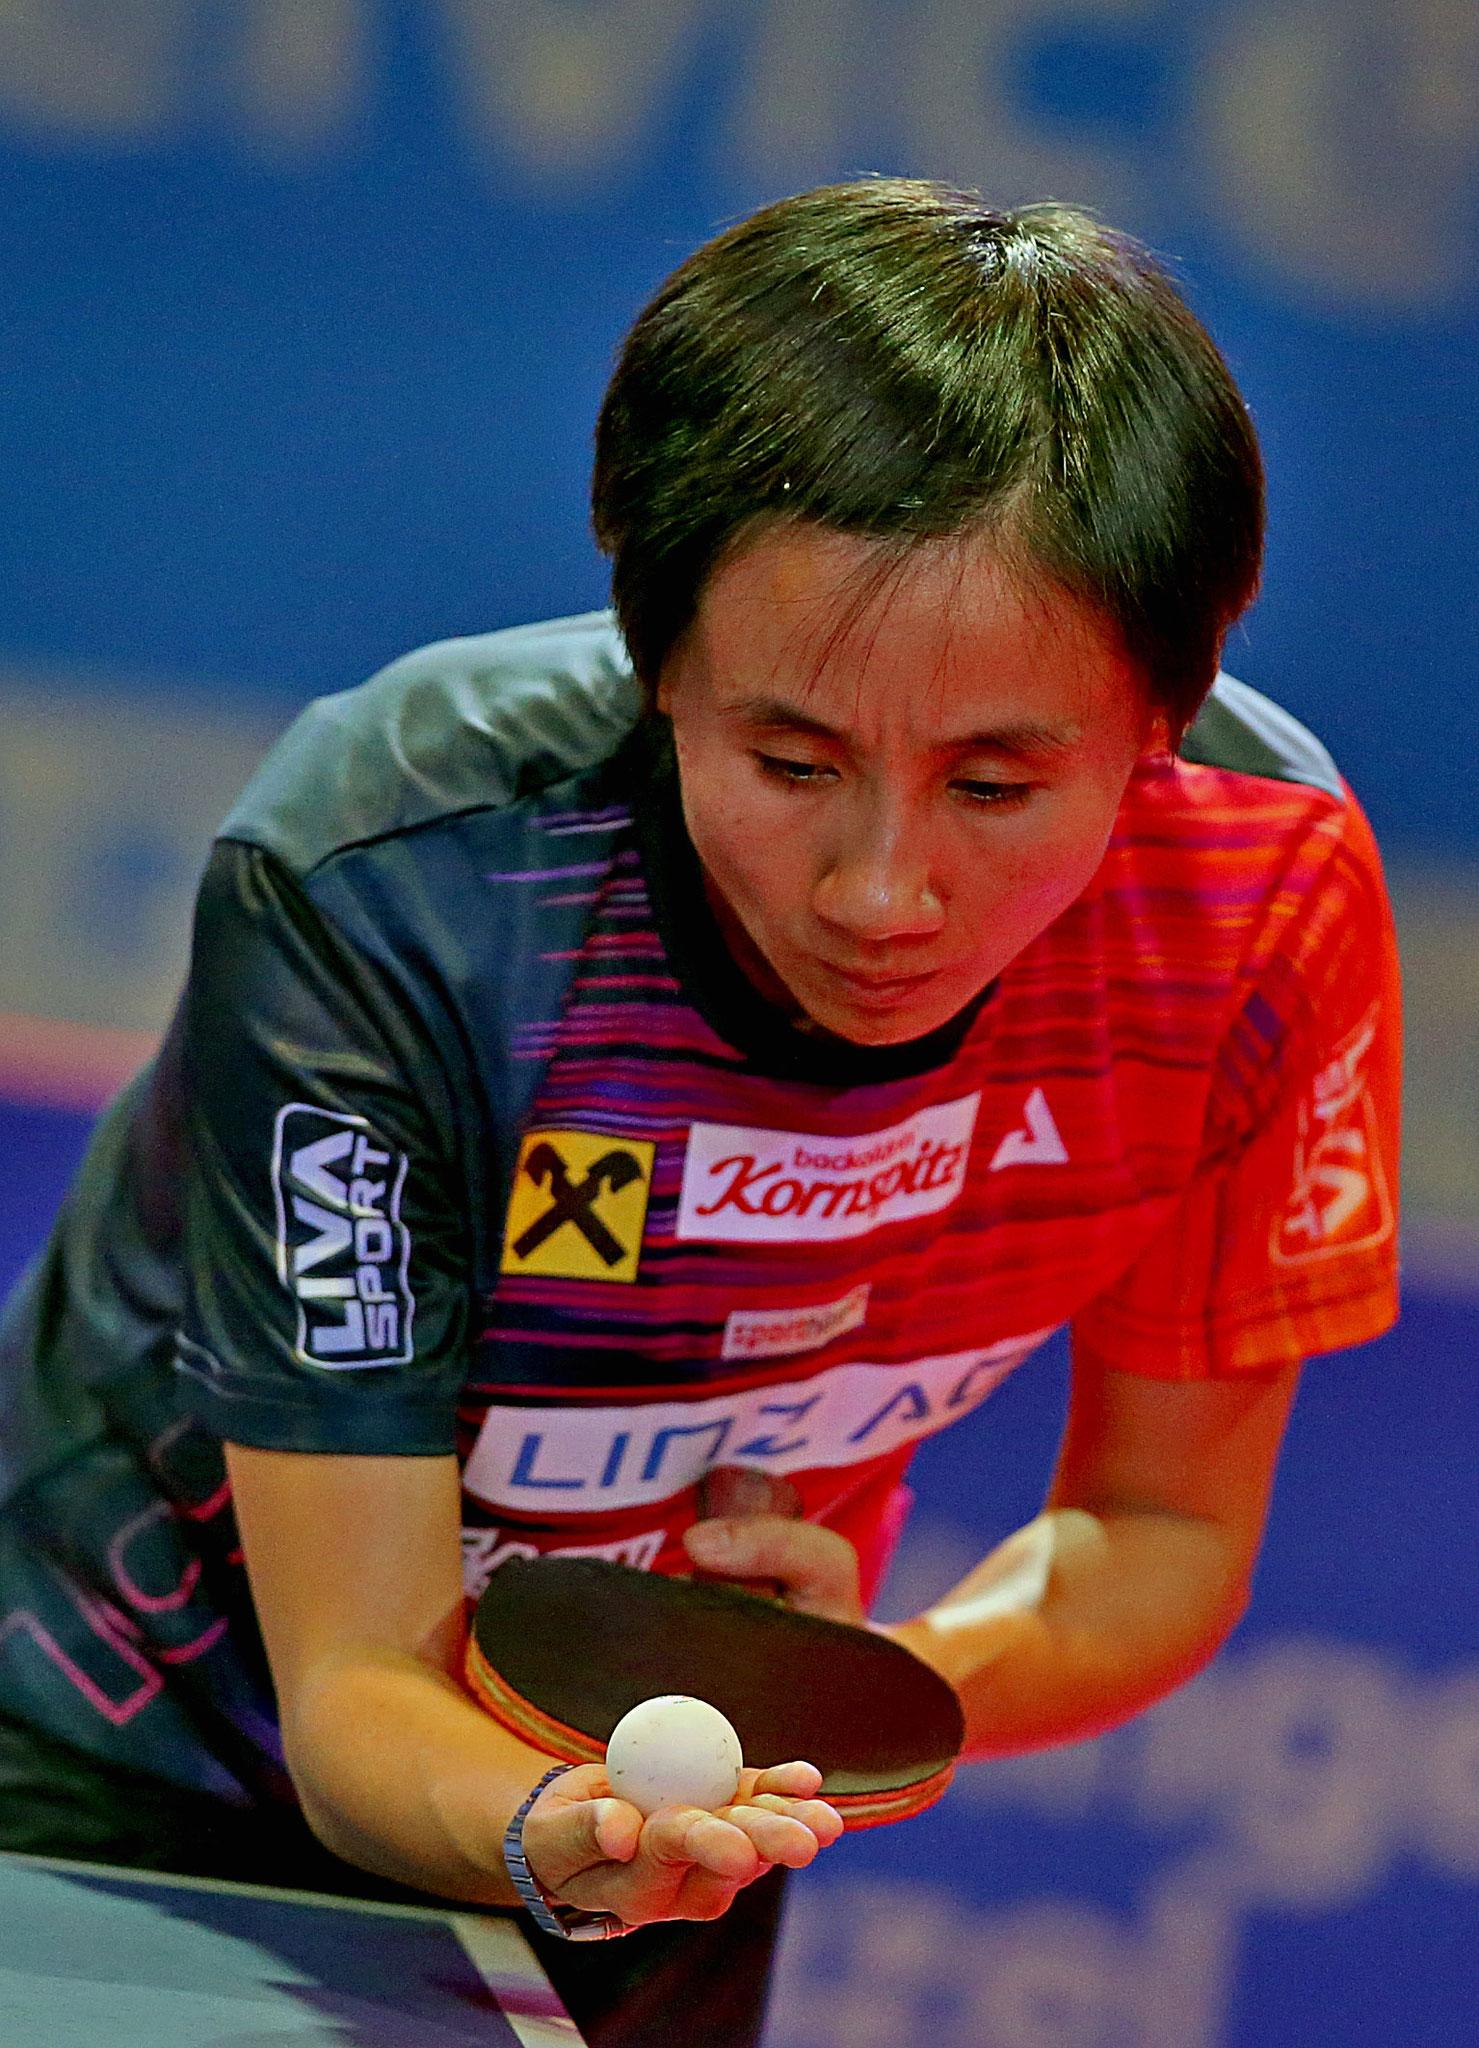 FOTO PLOHE - Liu Jia